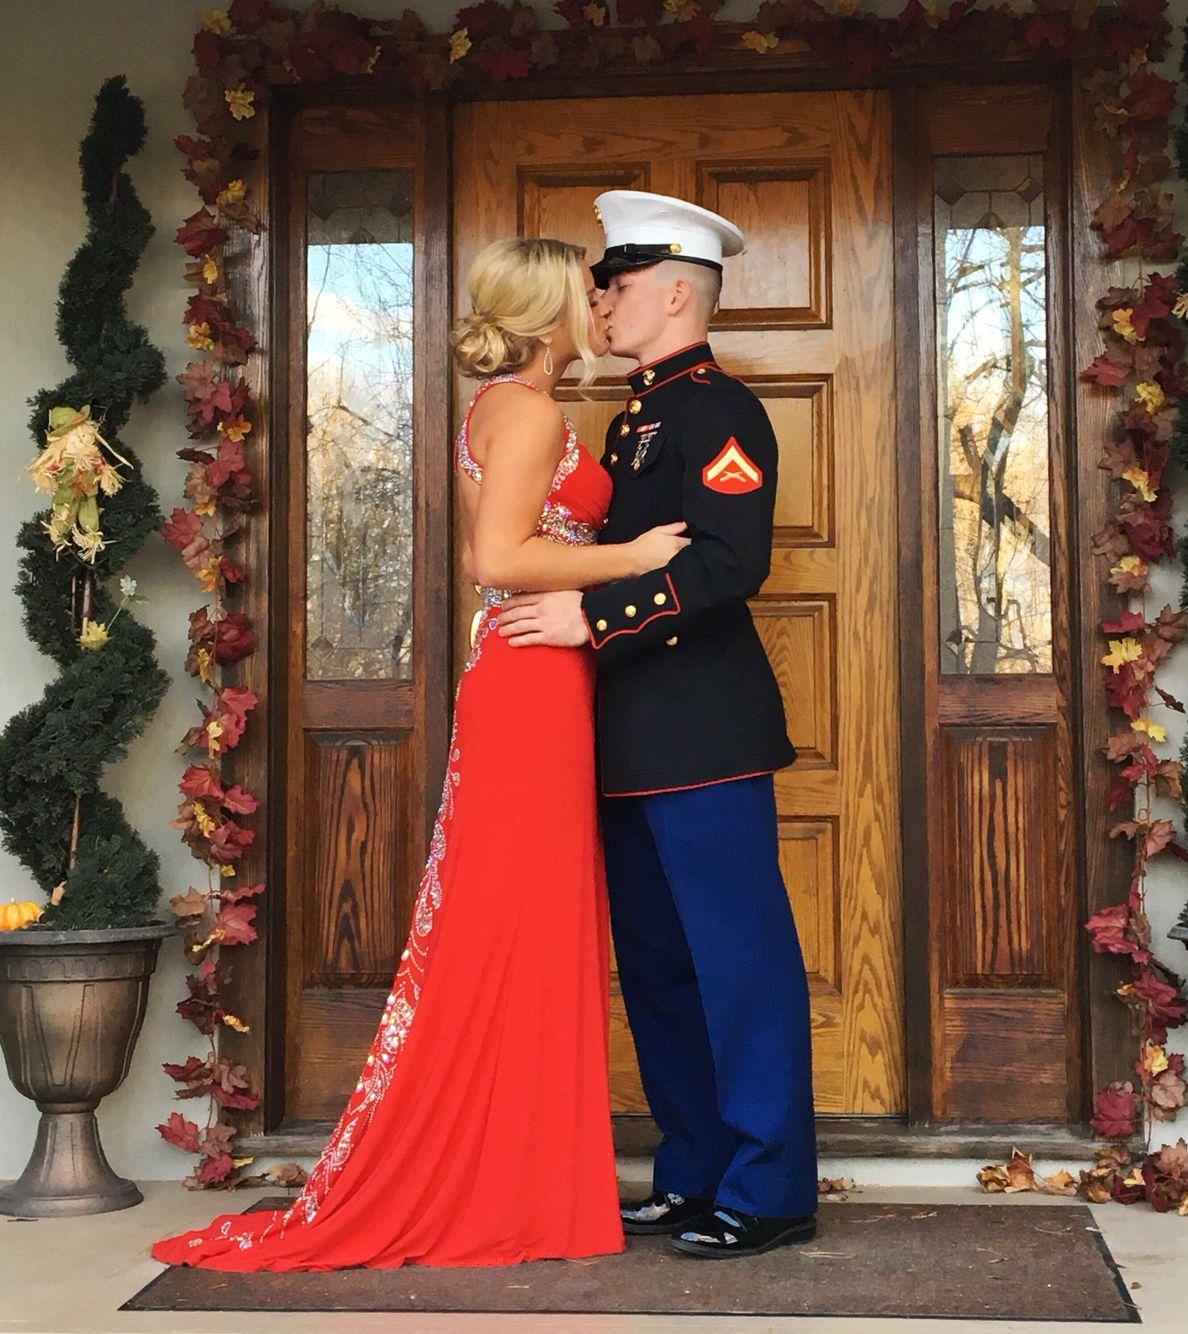 Dress up laundry kebon jeruk - Marine Corps Ball 2015 So Thankful For My Marine Boyfriend Marinecorps